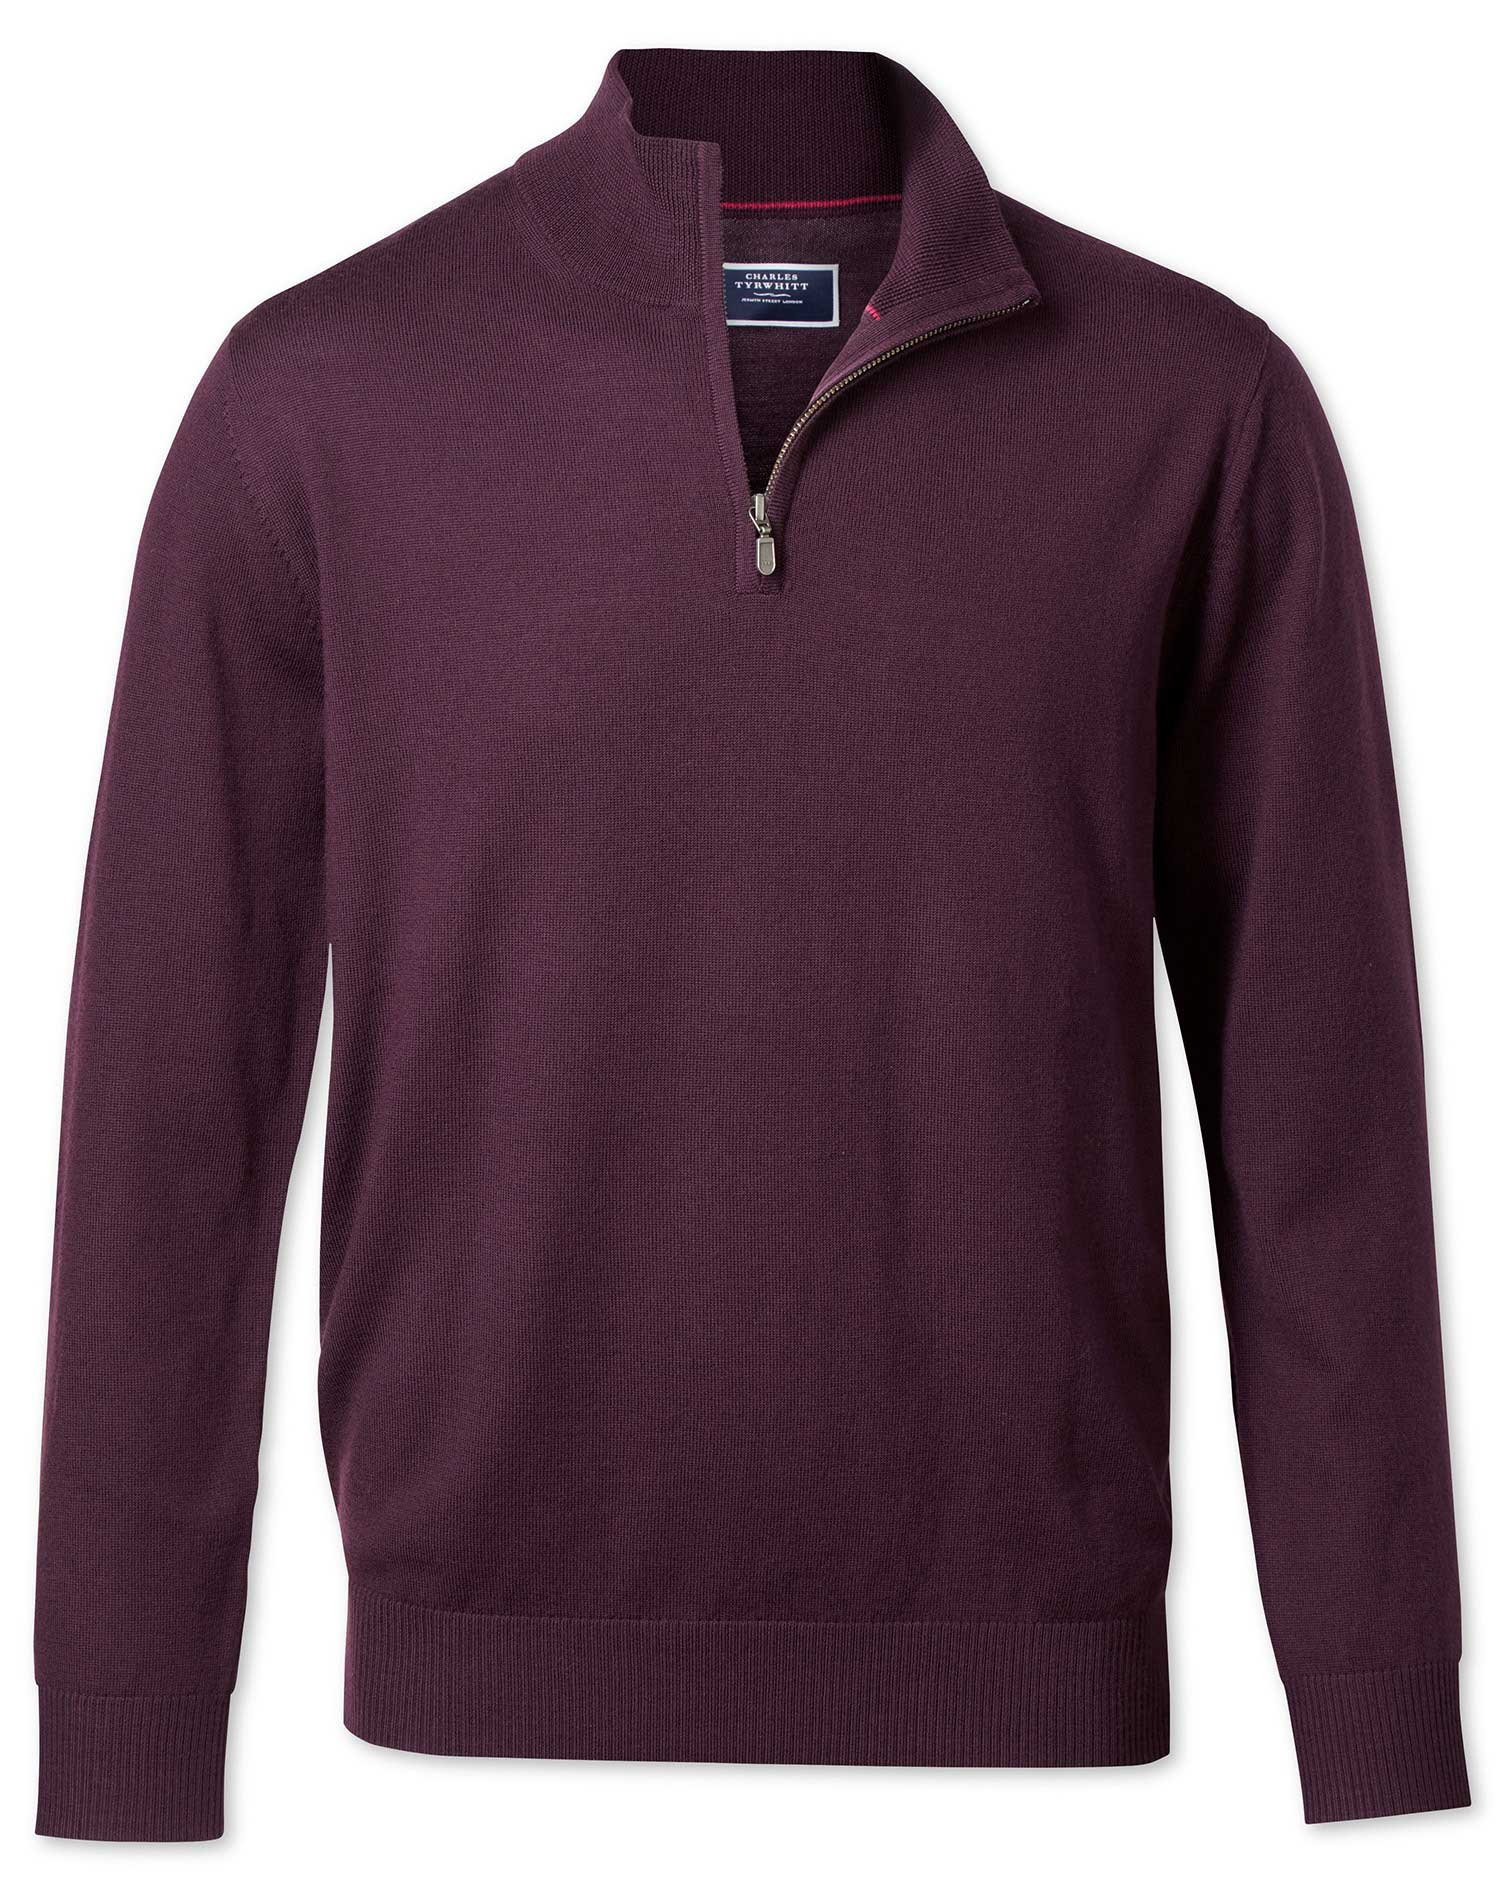 Wine Zip Neck Merino Wool Jumper Size XL by Charles Tyrwhitt